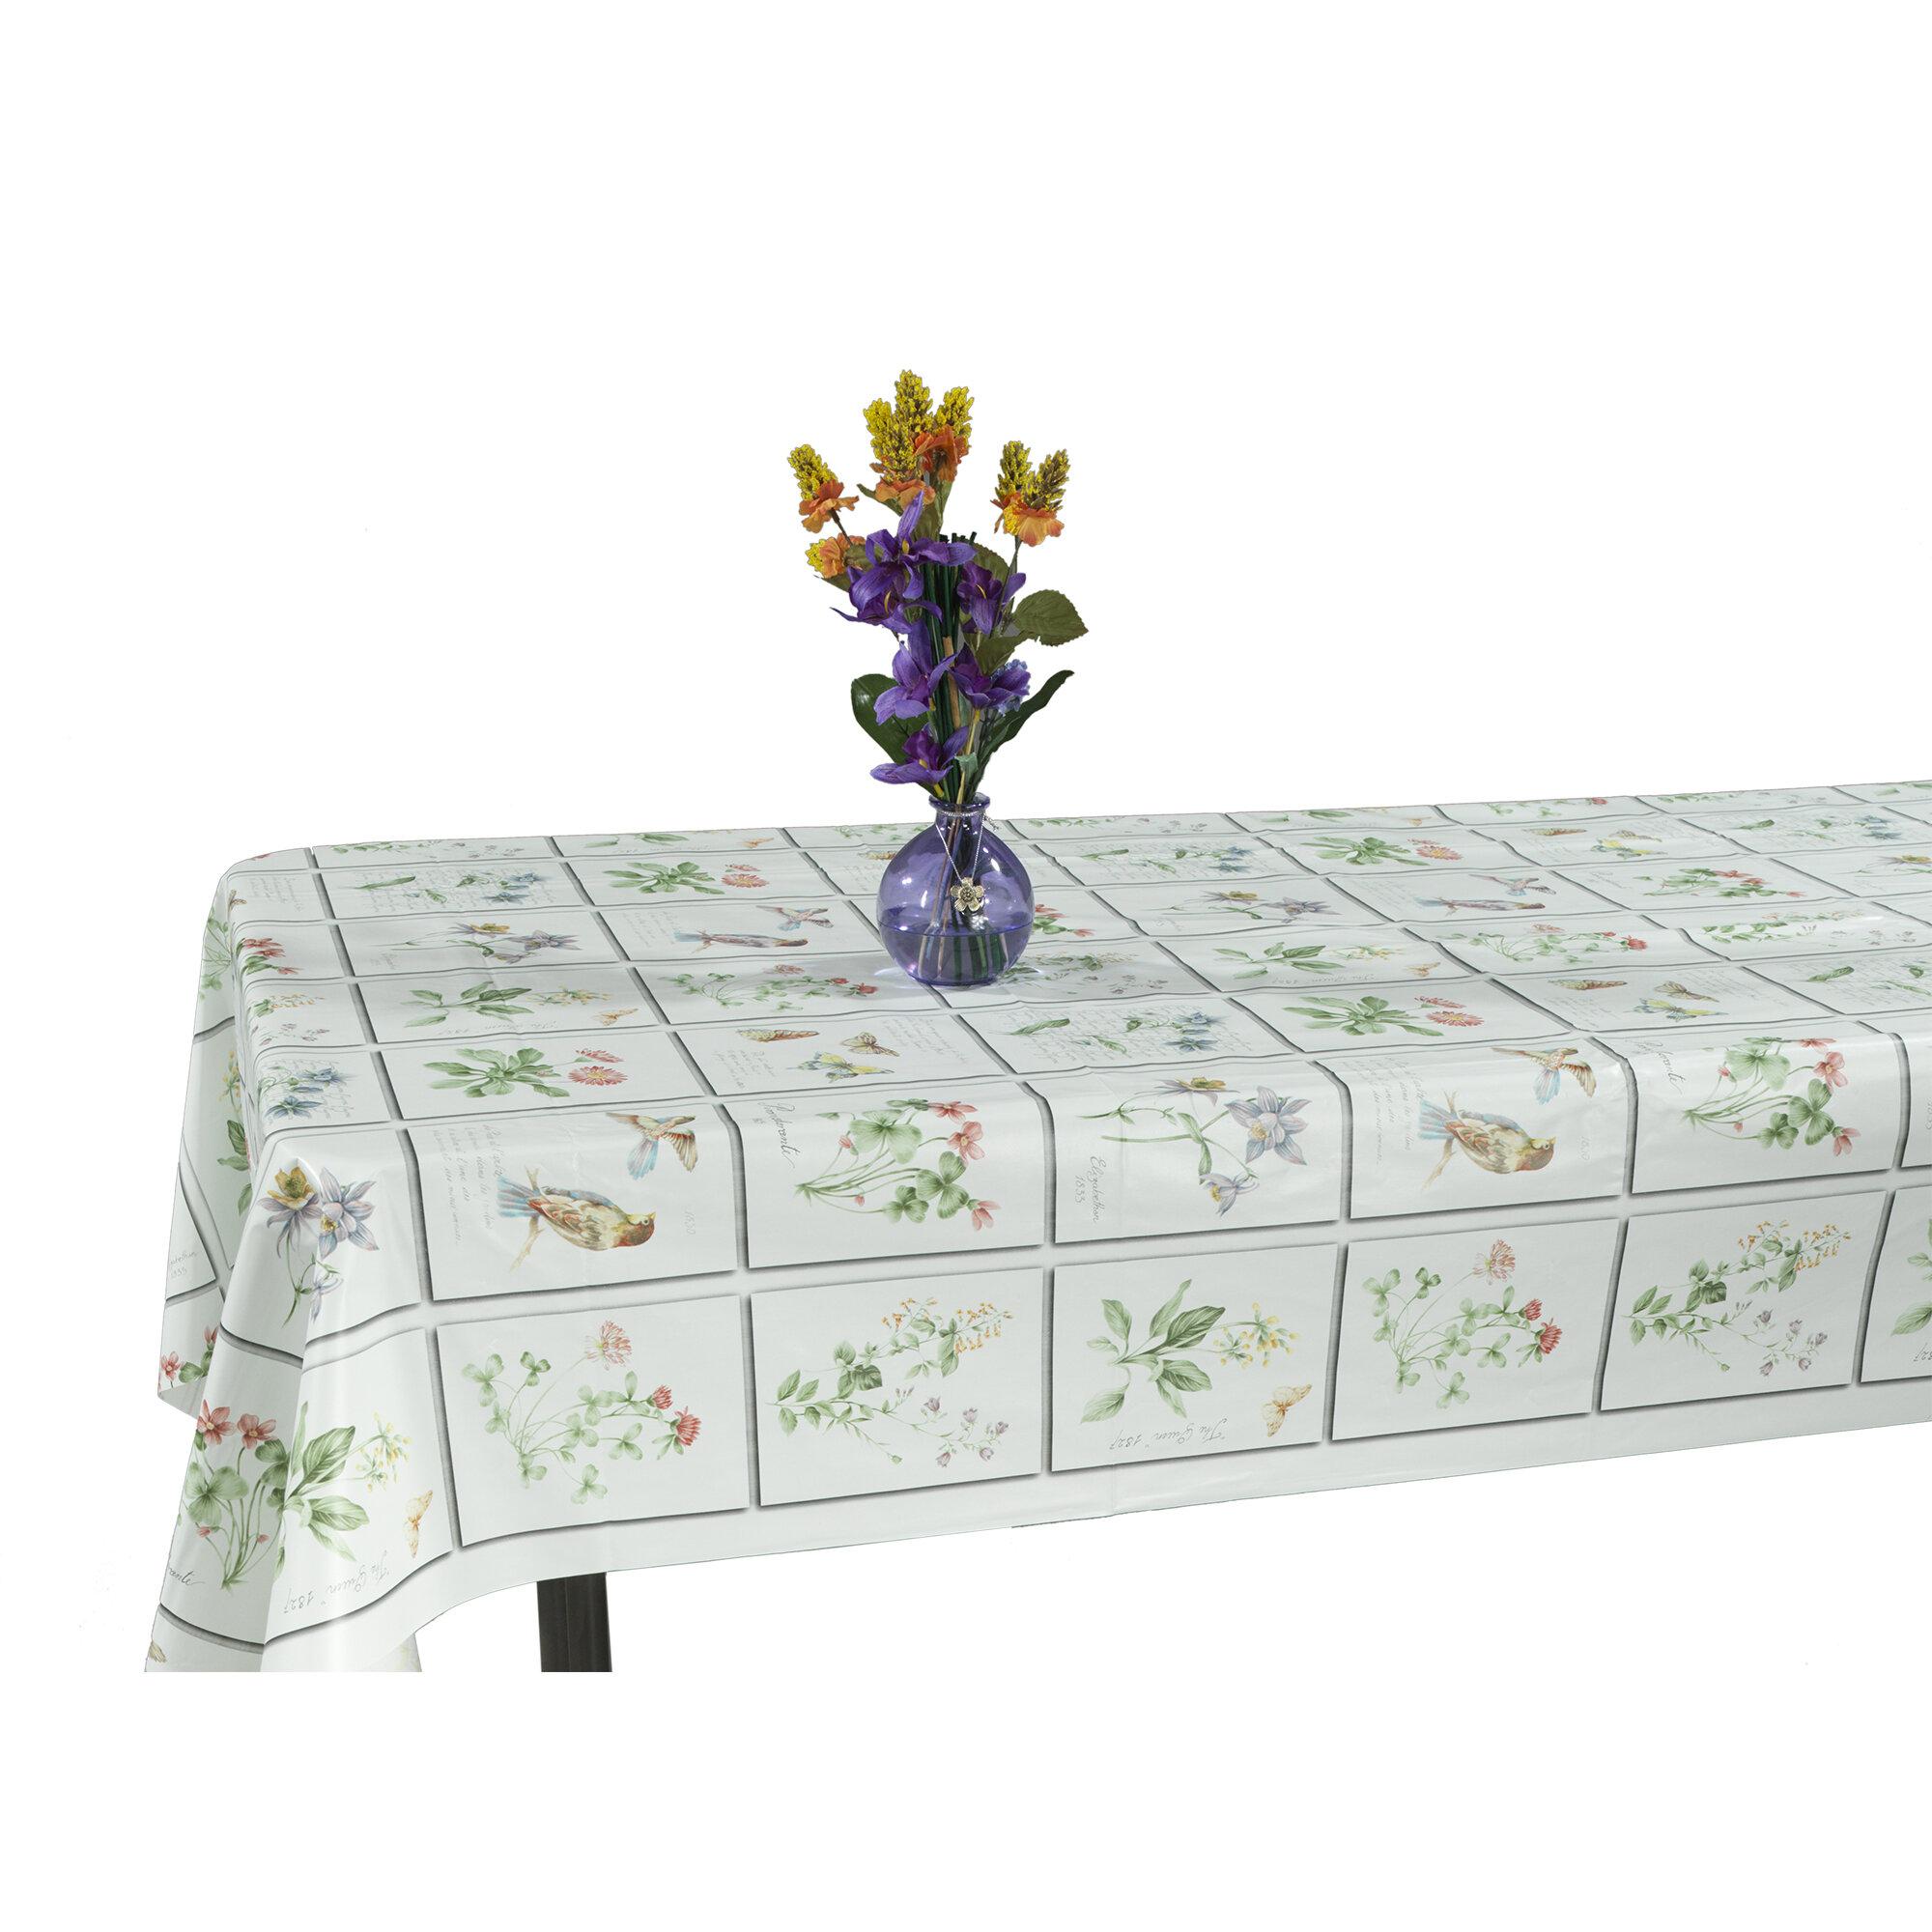 Ottomanson Essential Meadow Design Indoor/Outdoor Tablecloth ...